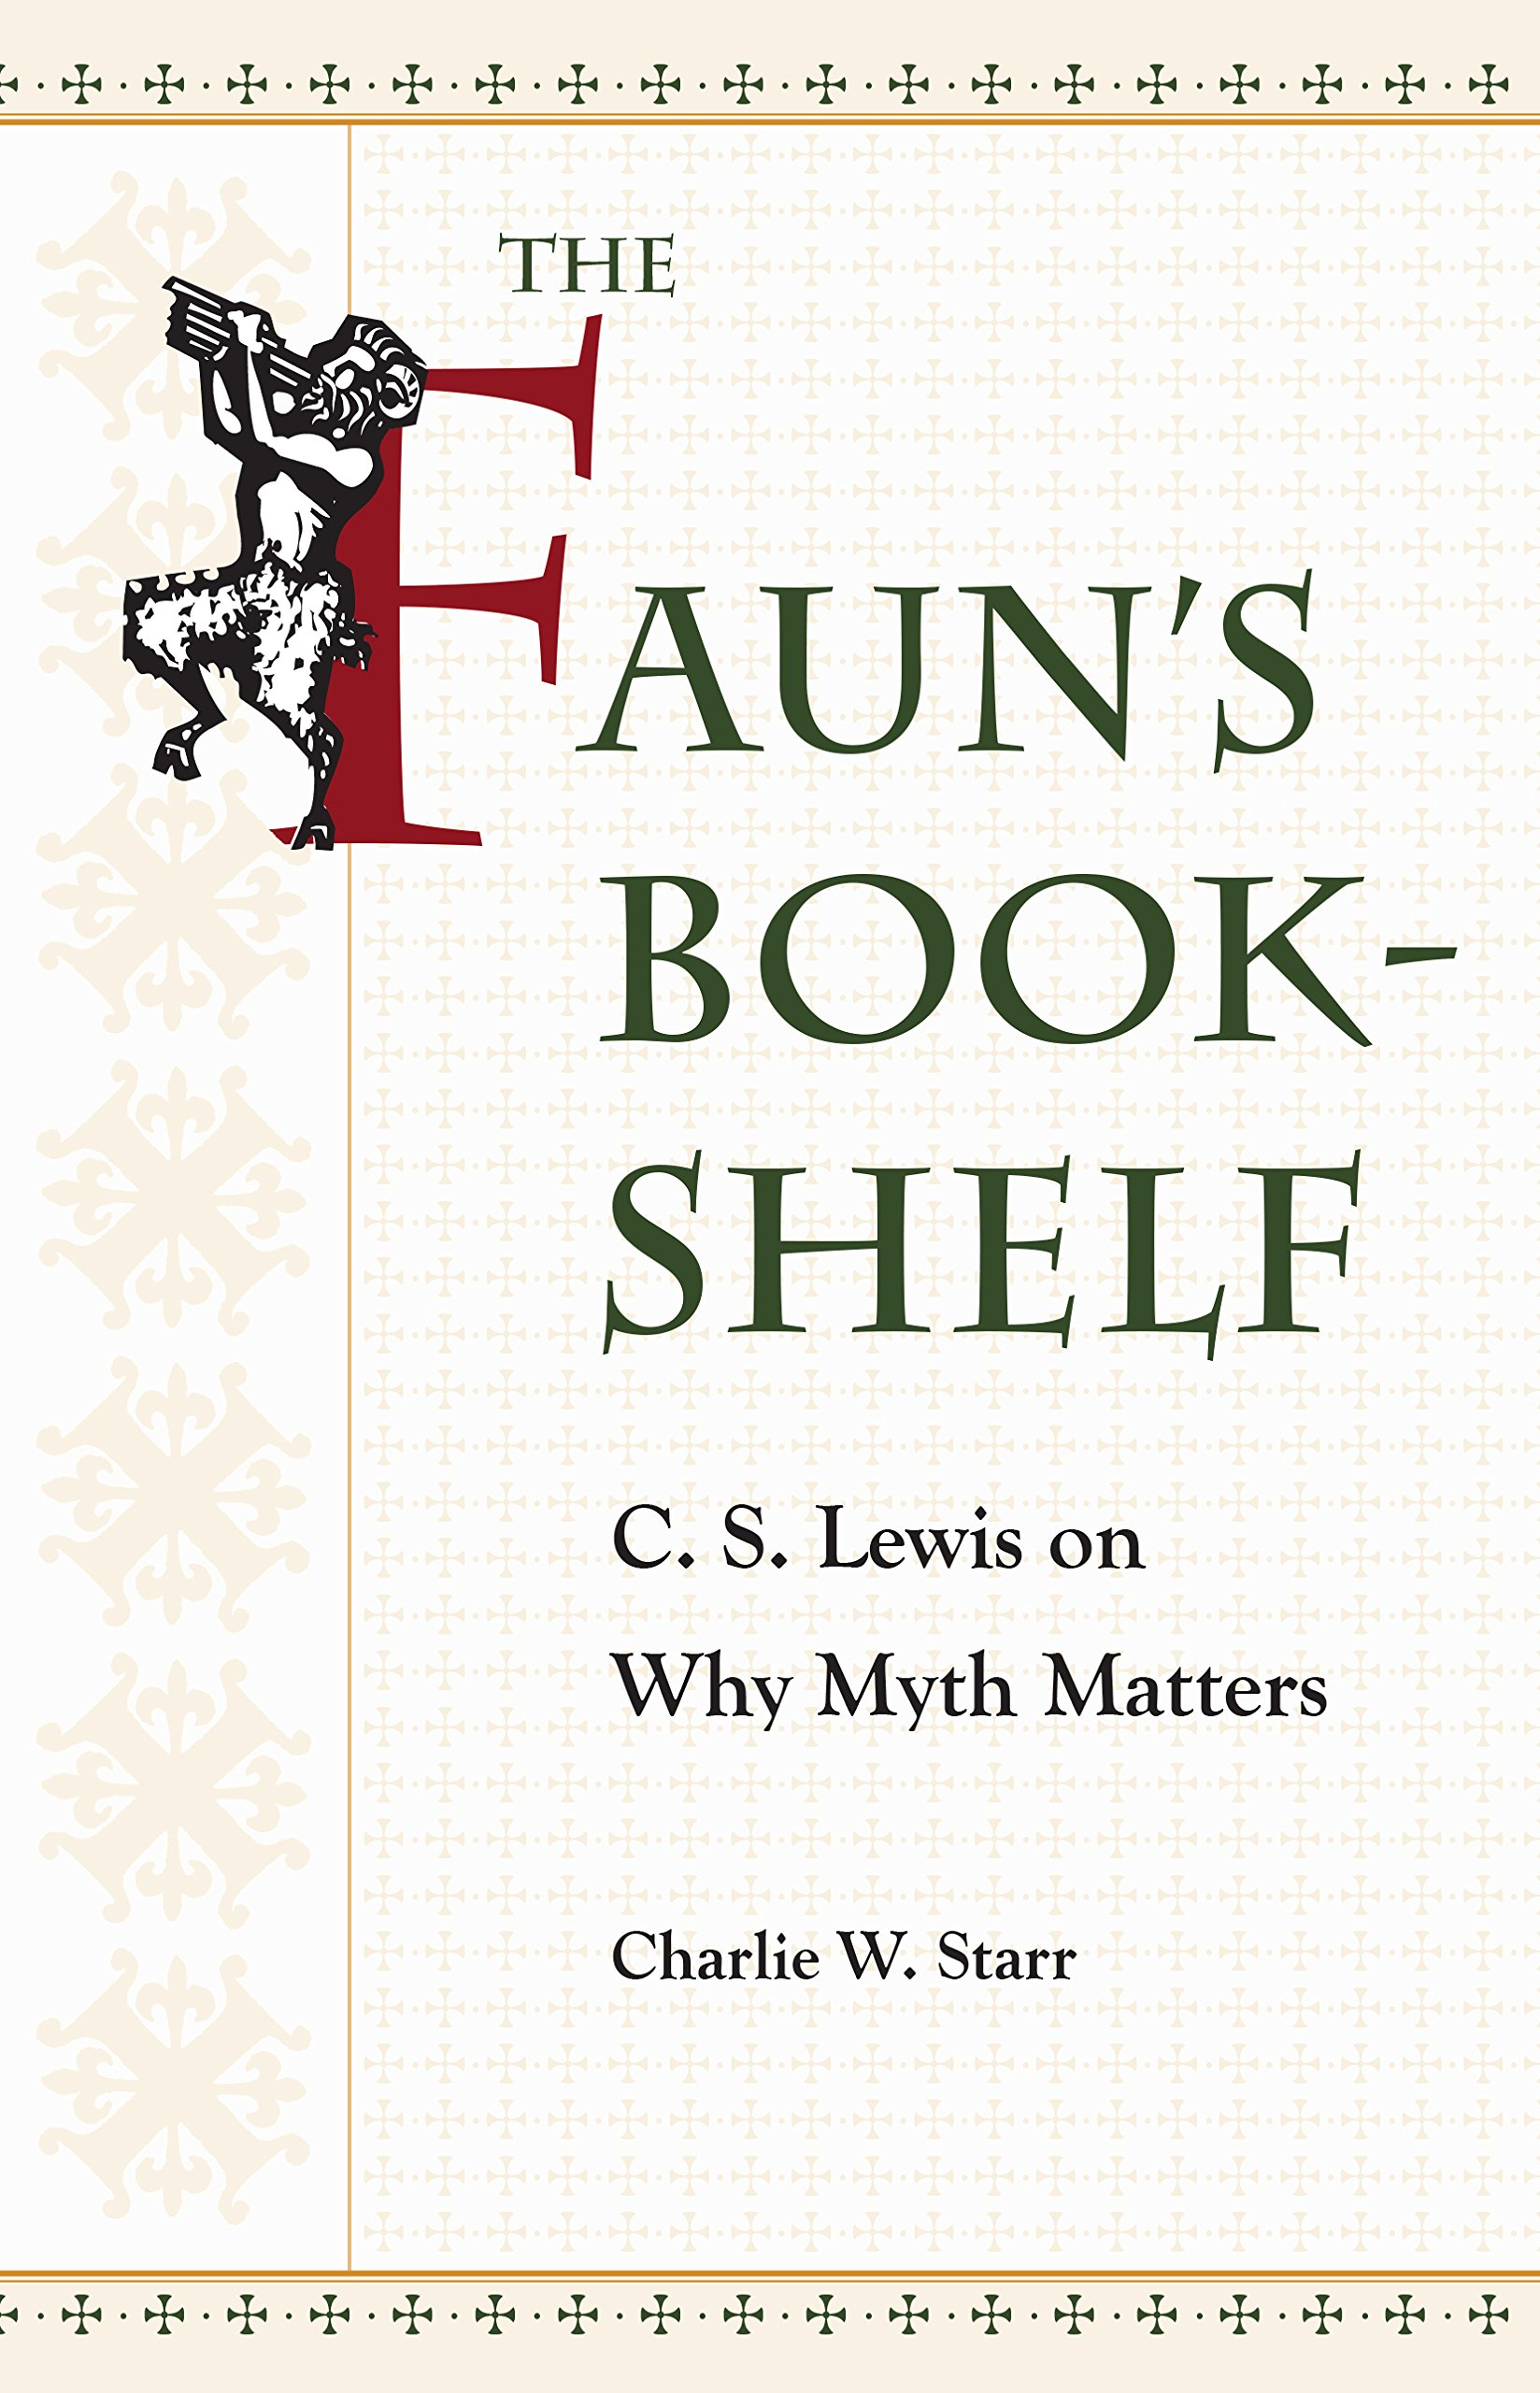 Amazon.com: The Faunu0027s Bookshelf: C. S. Lewis On Why Myth Matters  (9781606353493): Charlie W. Starr: Books